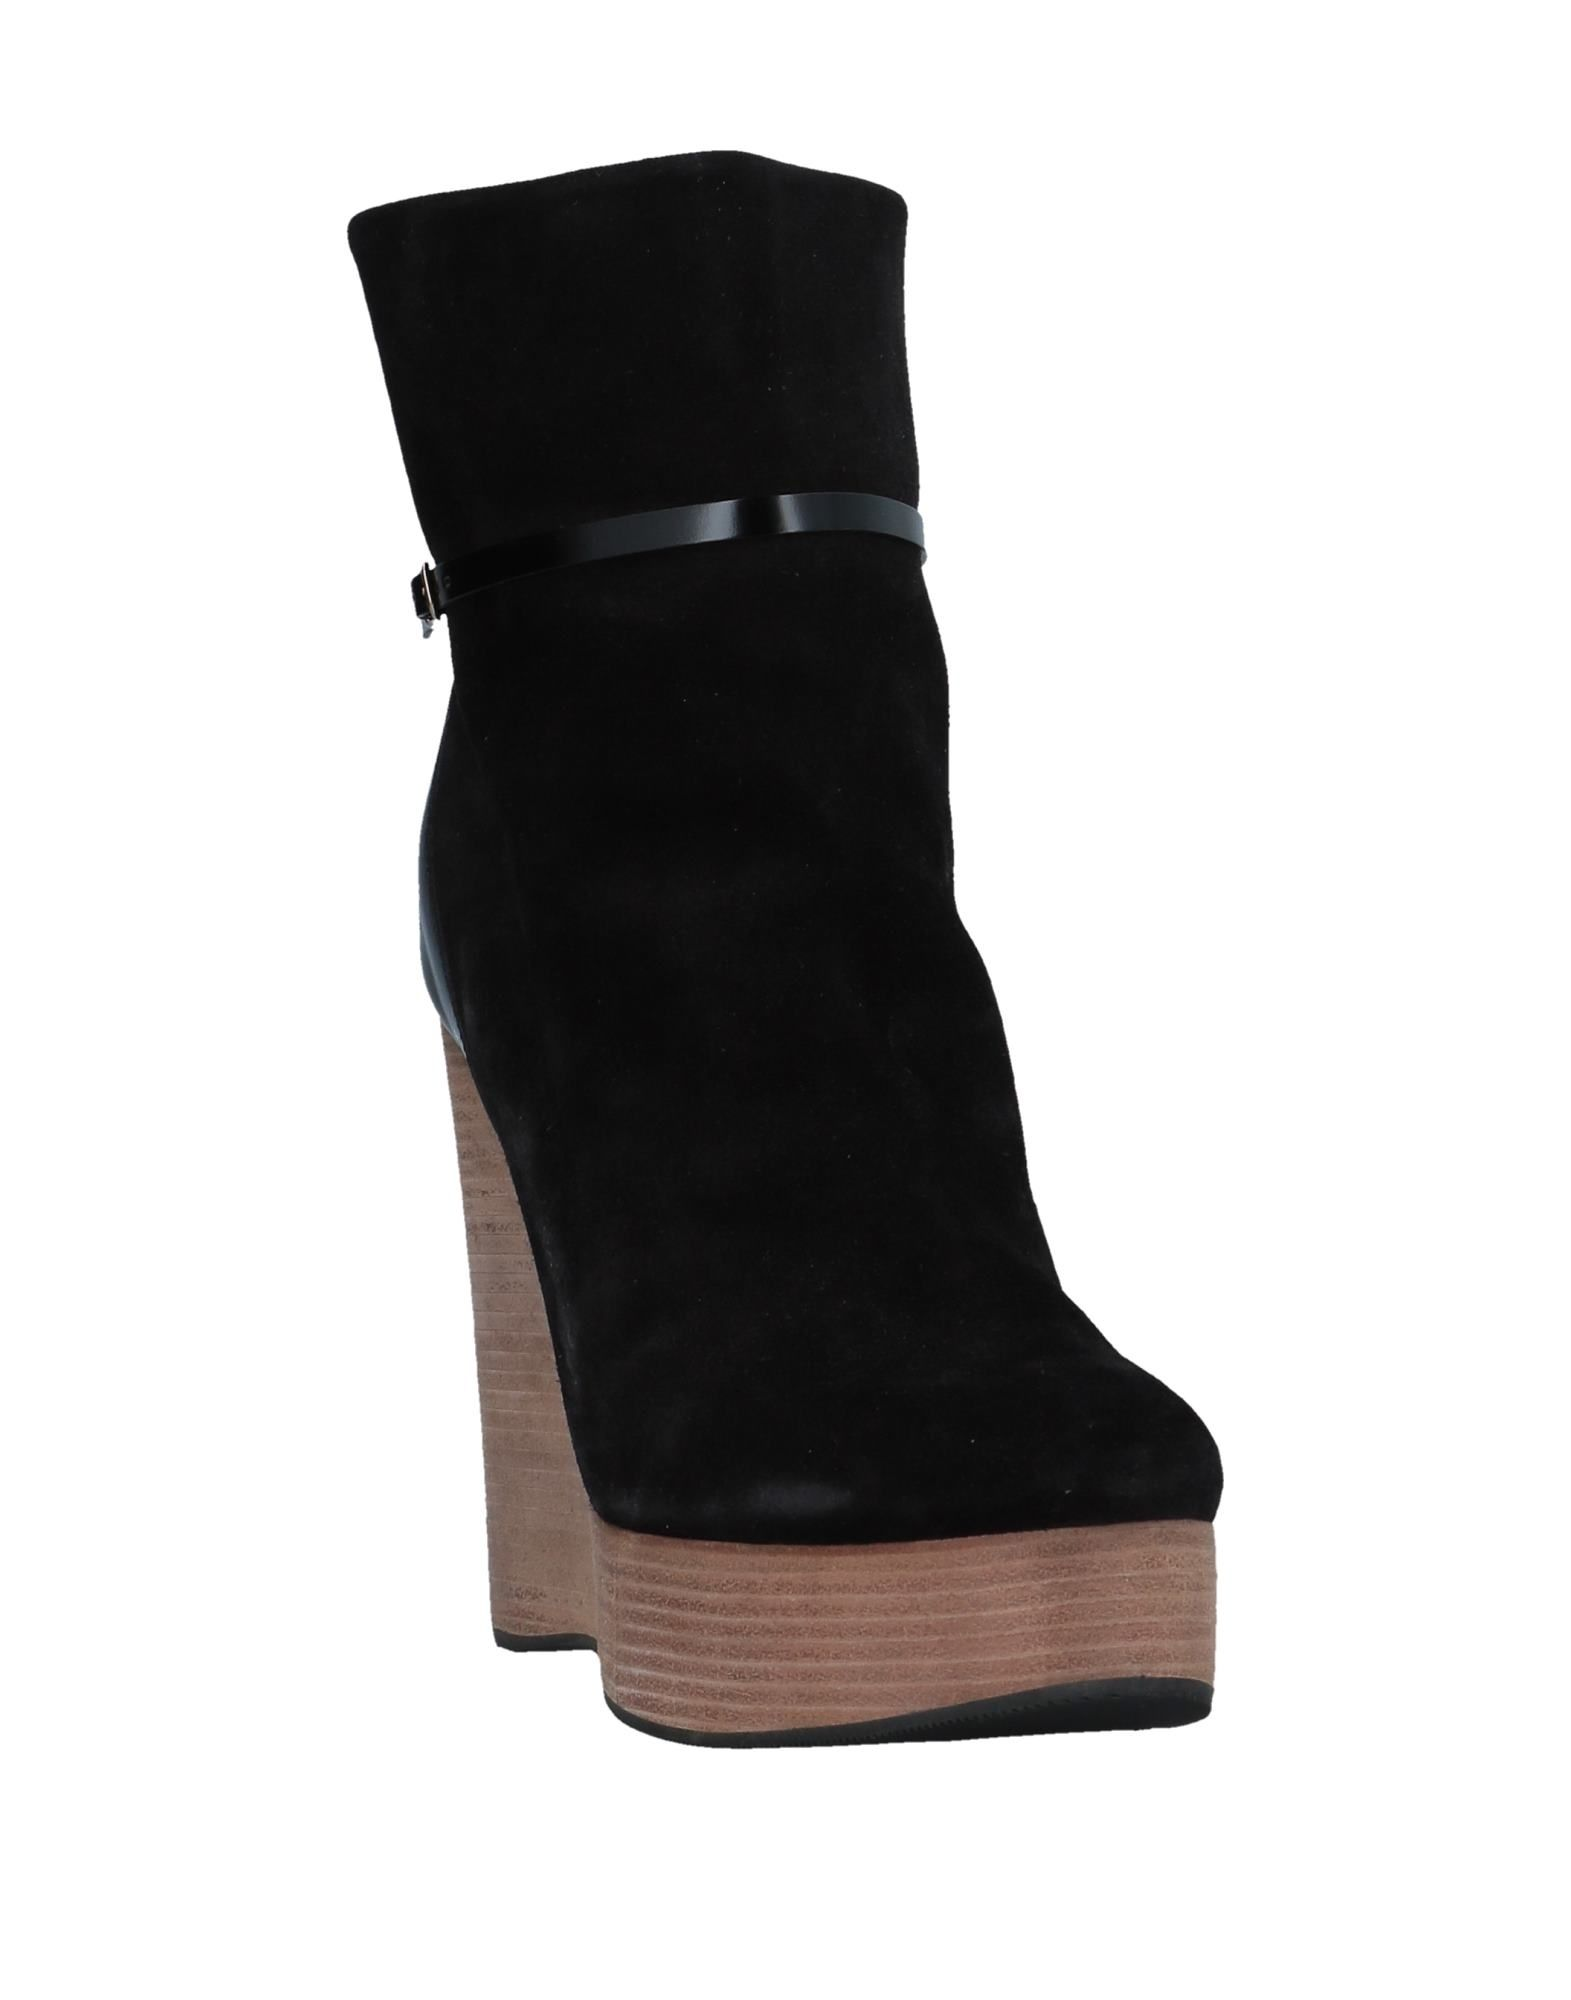 Chloé Stiefelette Damen Schuhe  11100001PAGünstige gut aussehende Schuhe Damen c7b3a8